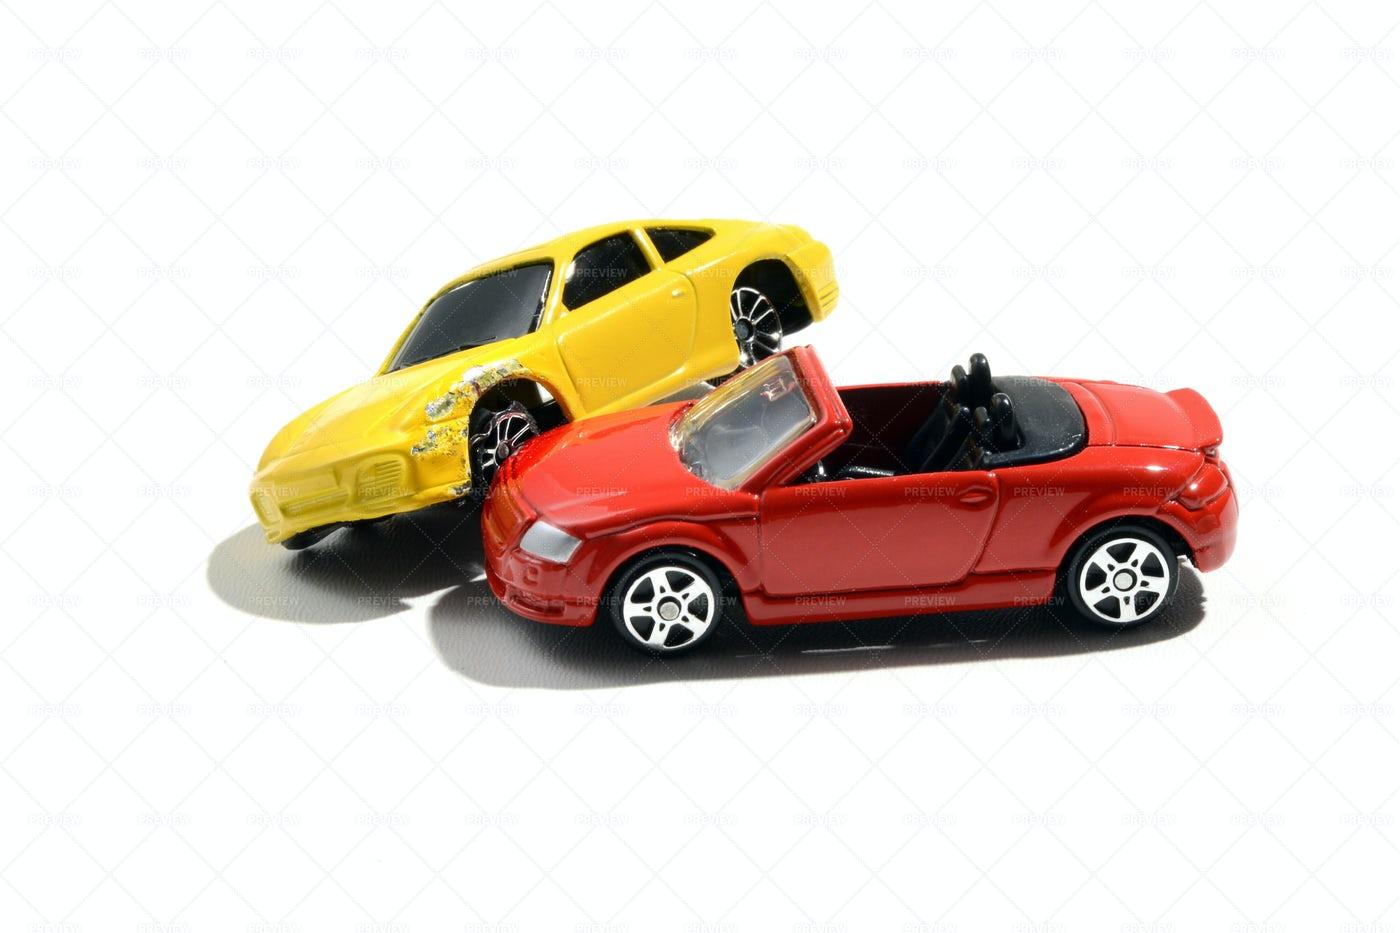 Crashed Toy Cars: Stock Photos